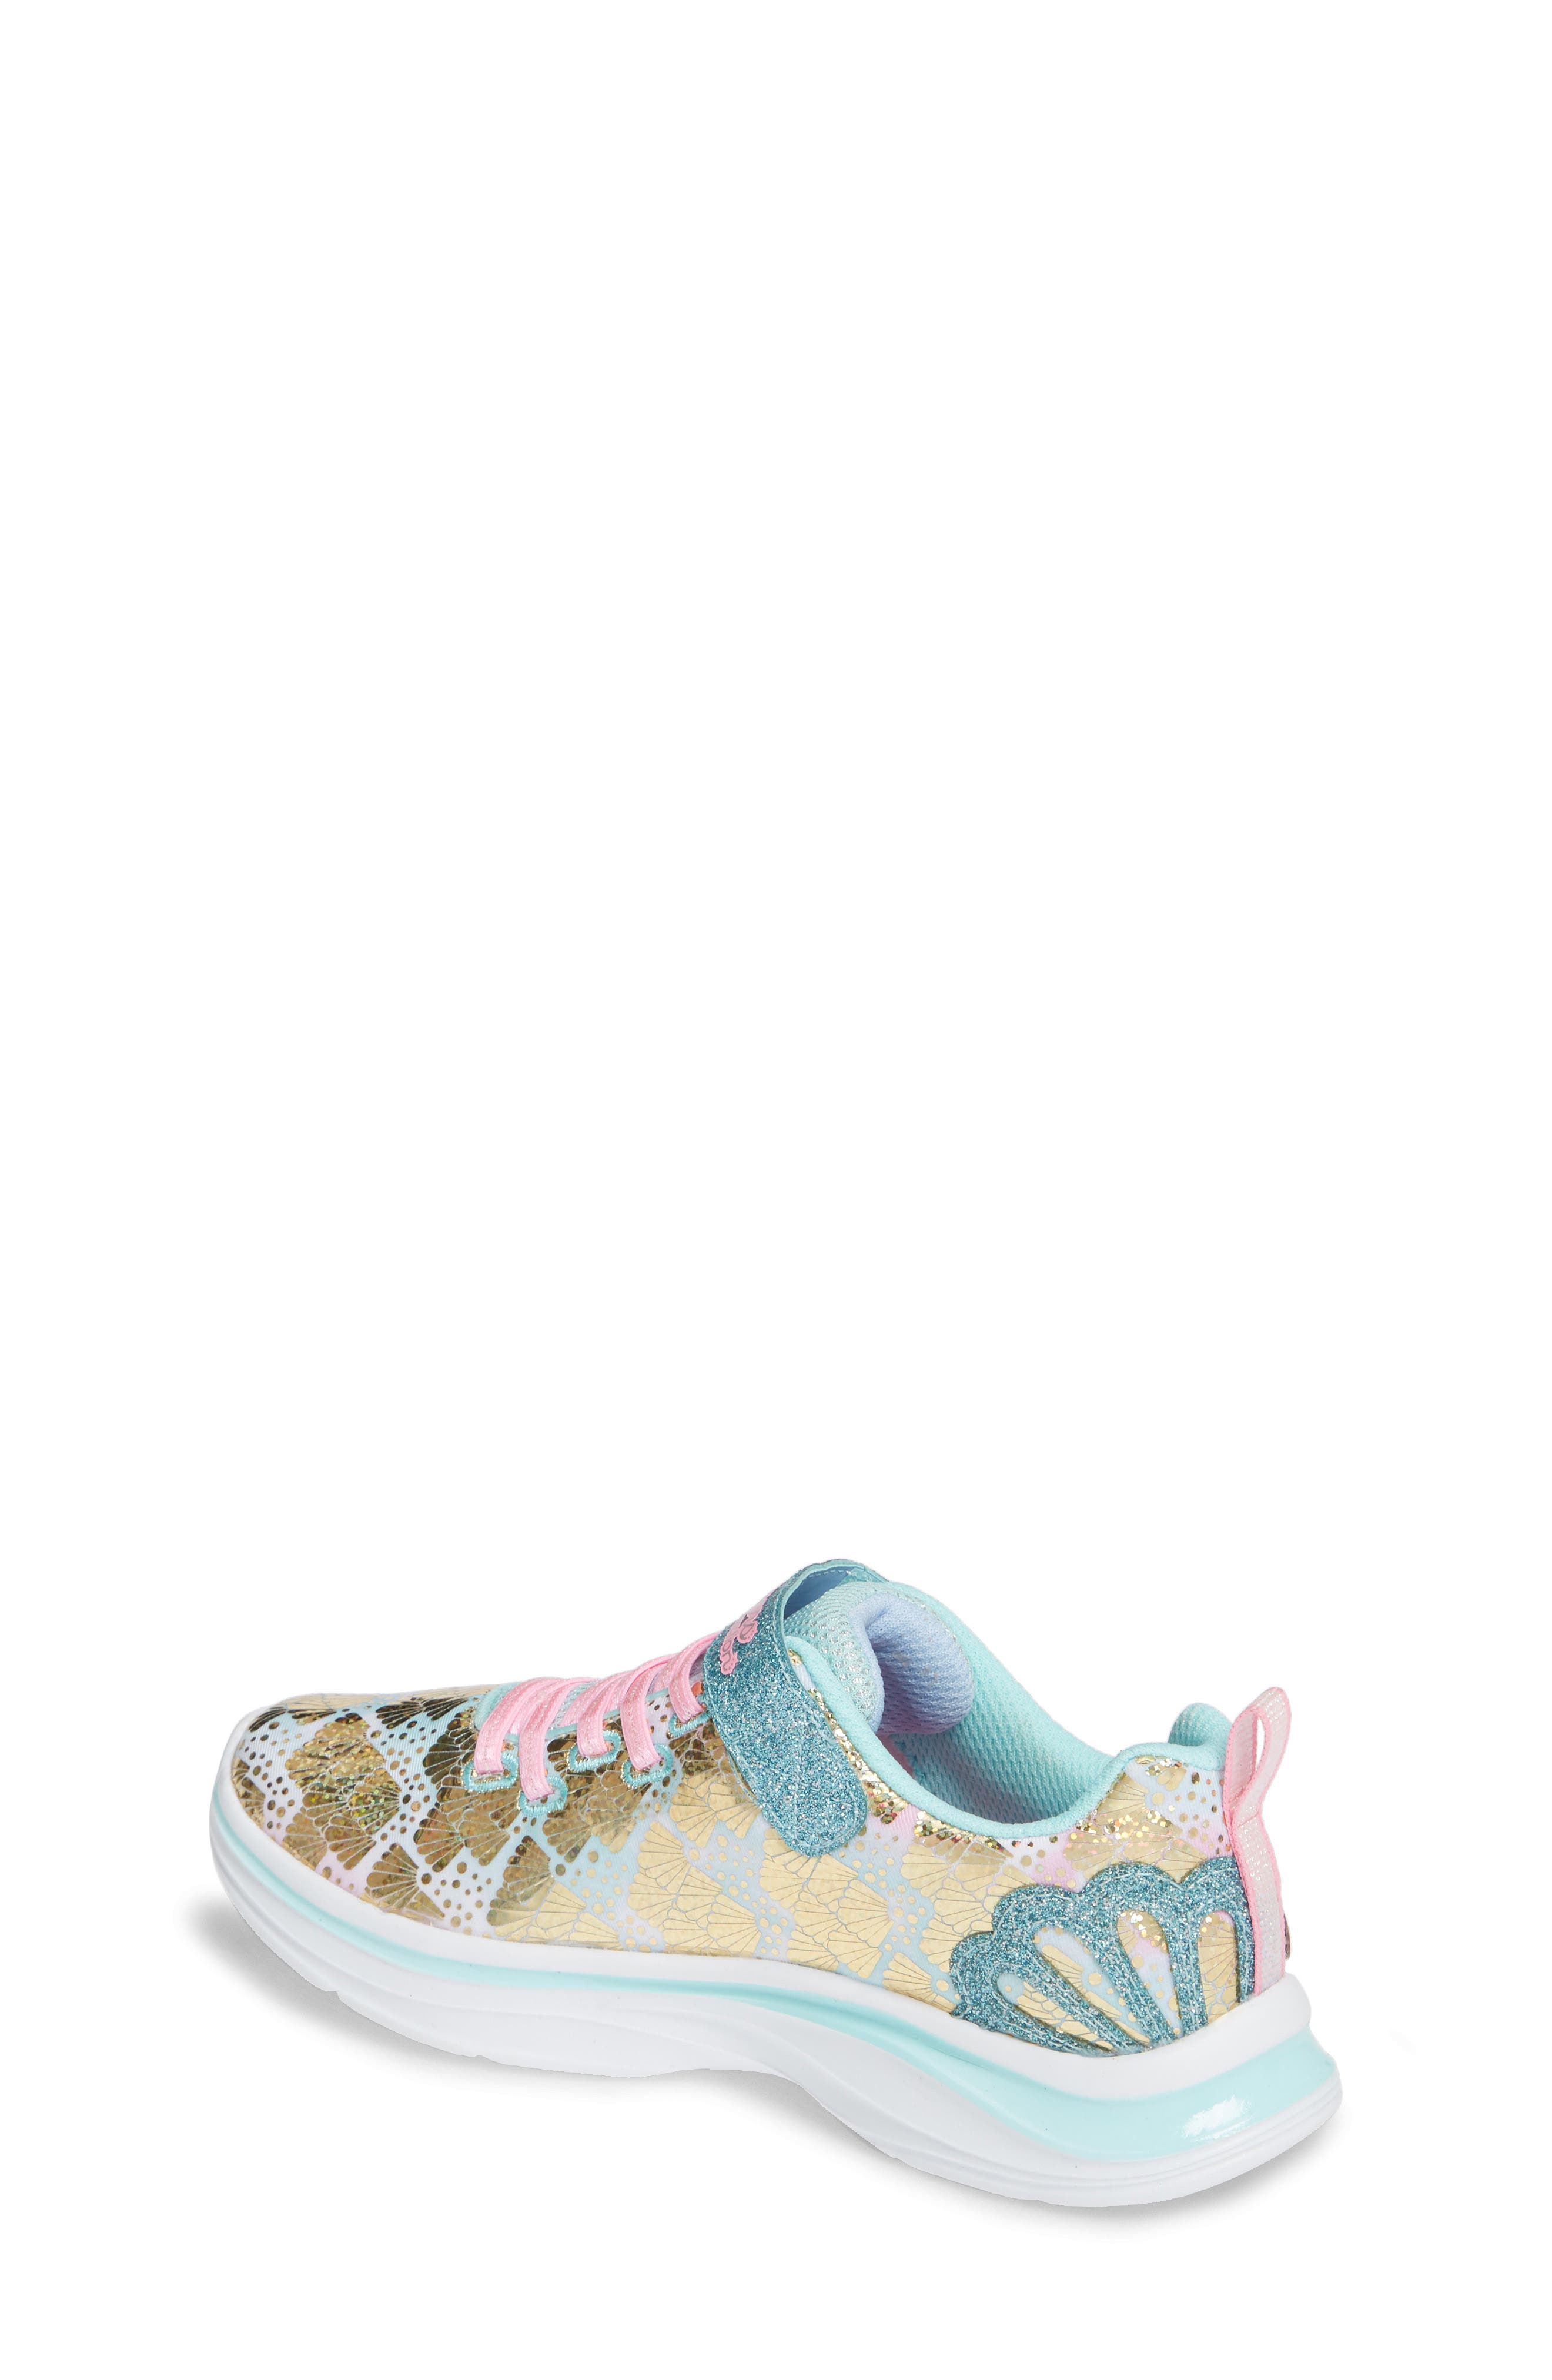 Double Dreams Shimmer Sneaker,                             Alternate thumbnail 2, color,                             AQUA/ PINK TEXTILE